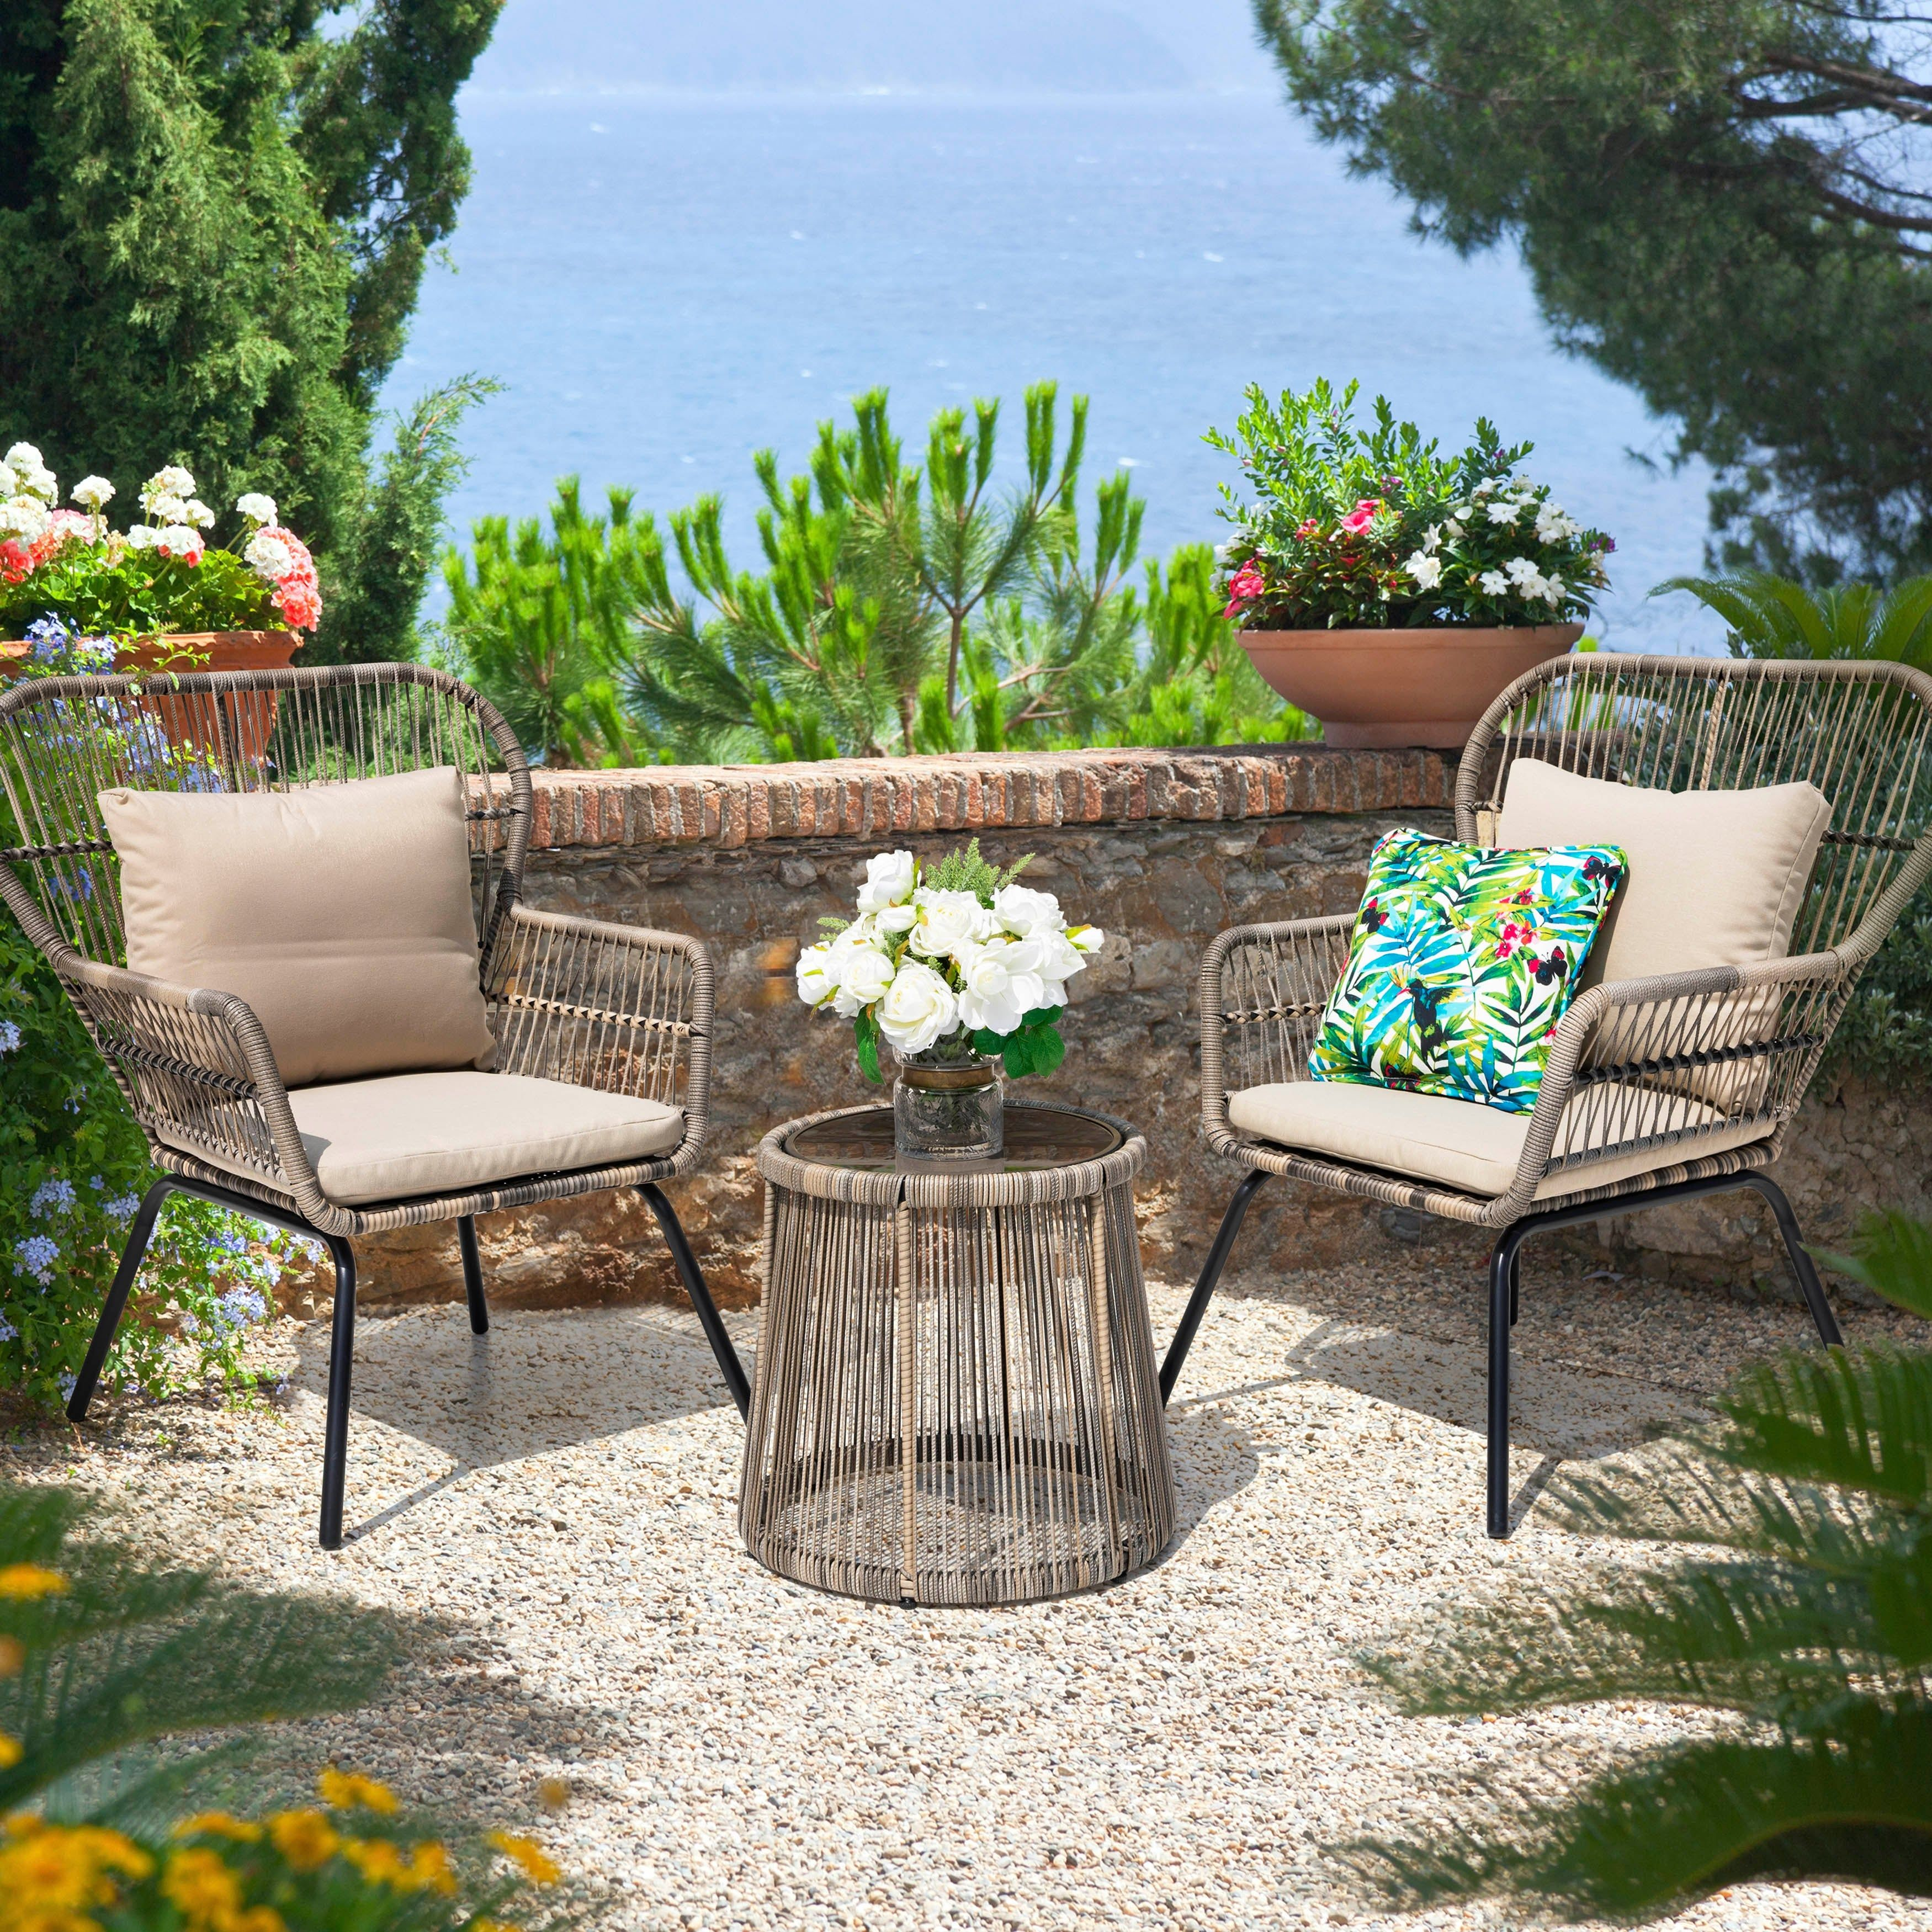 Our Best Patio Furniture Deals In 2021 Conversation Set Patio Bistro Set Patio